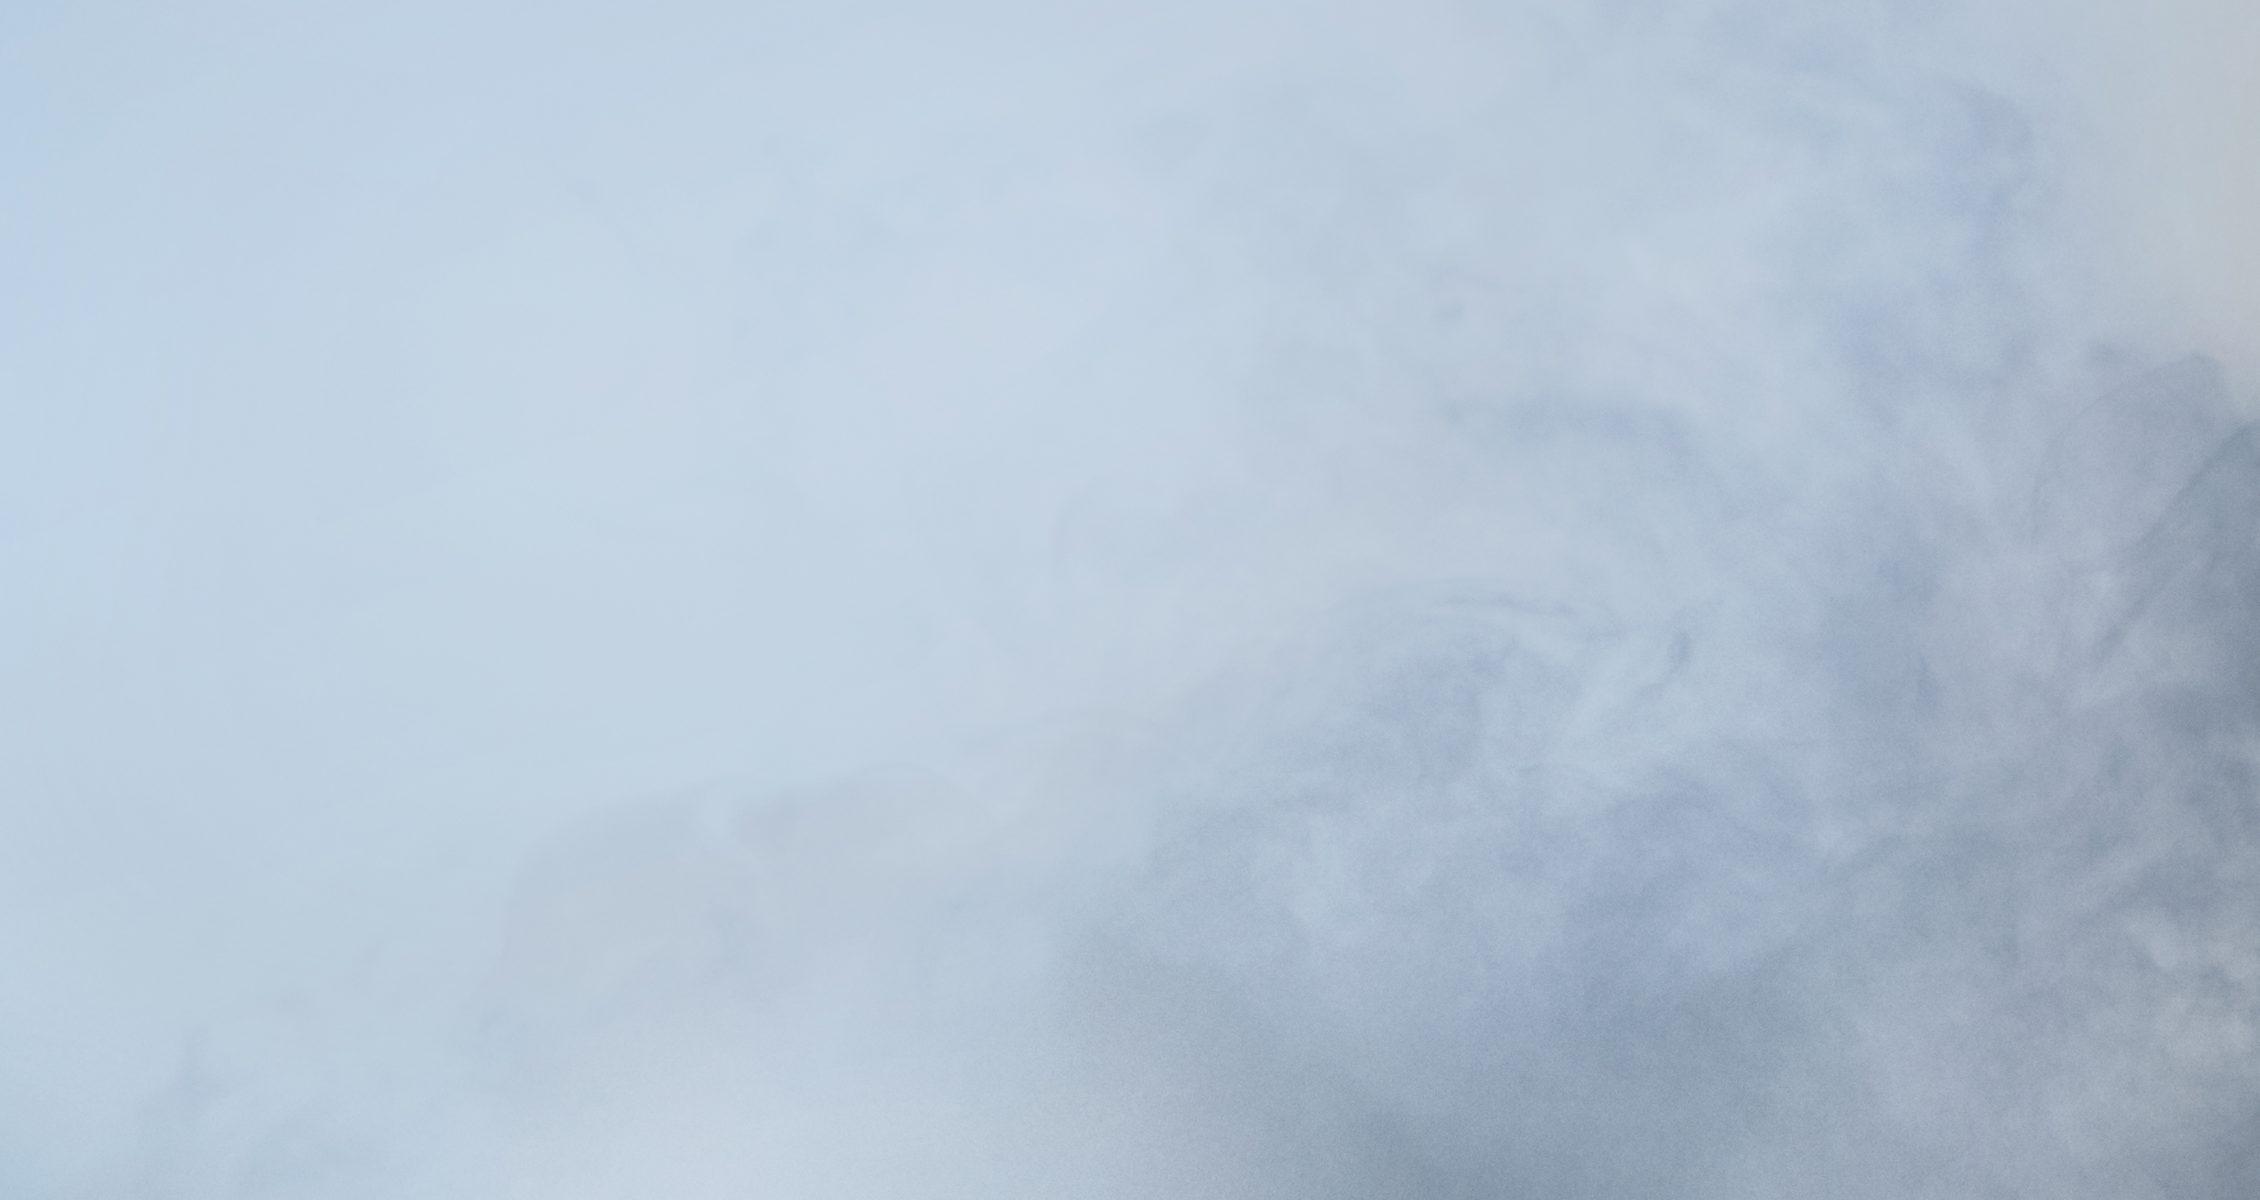 a puff of aerosol on a light blue background